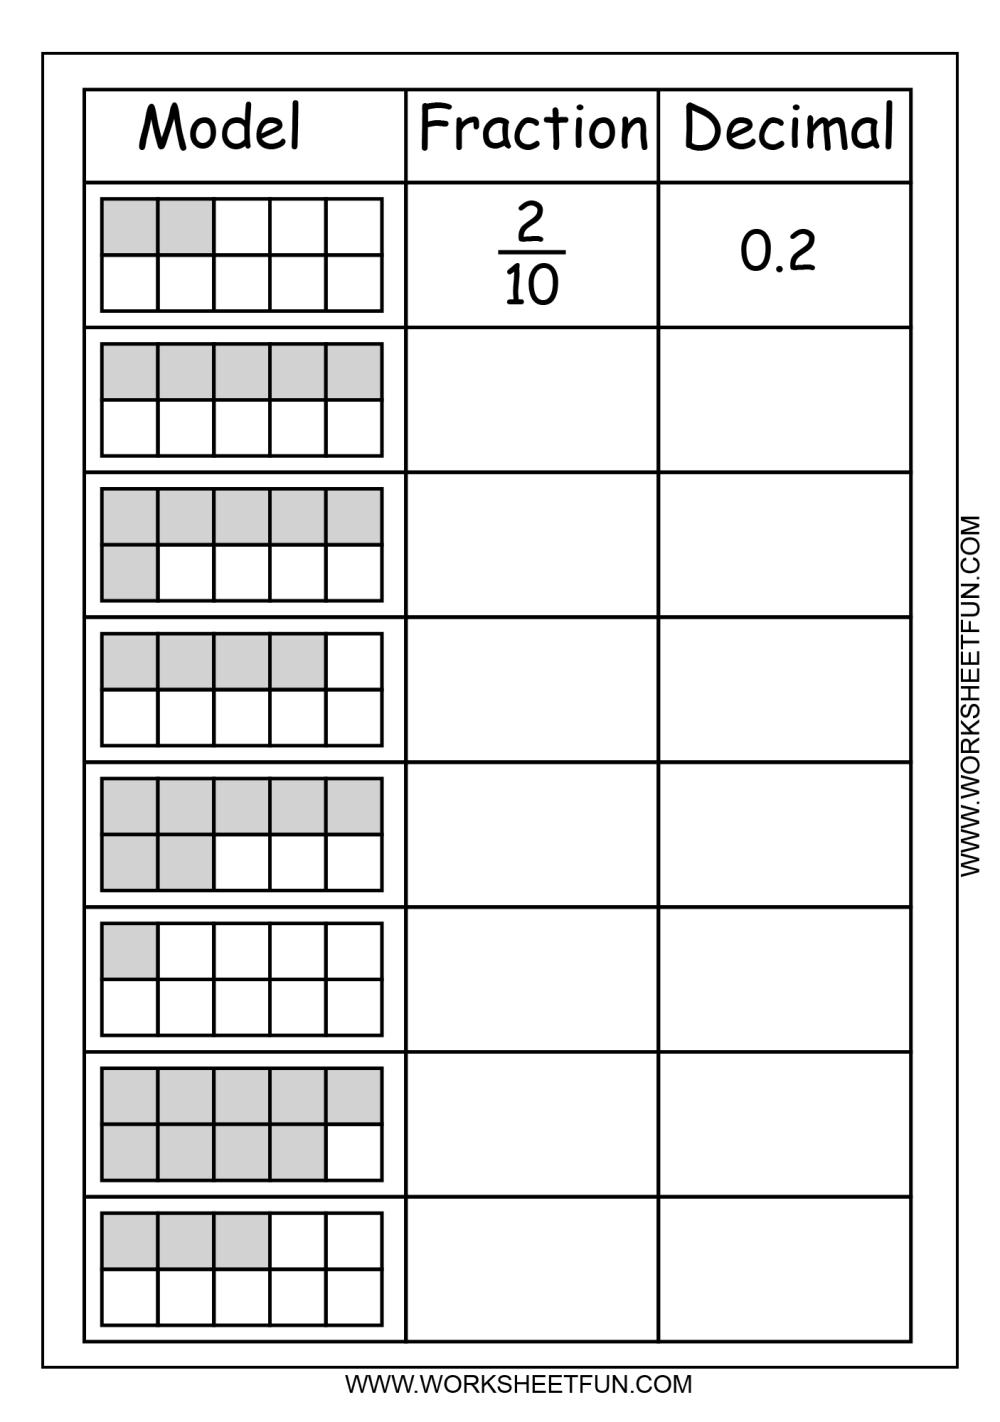 medium resolution of Multiplying Fractions Using Models Worksheet - Nidecmege